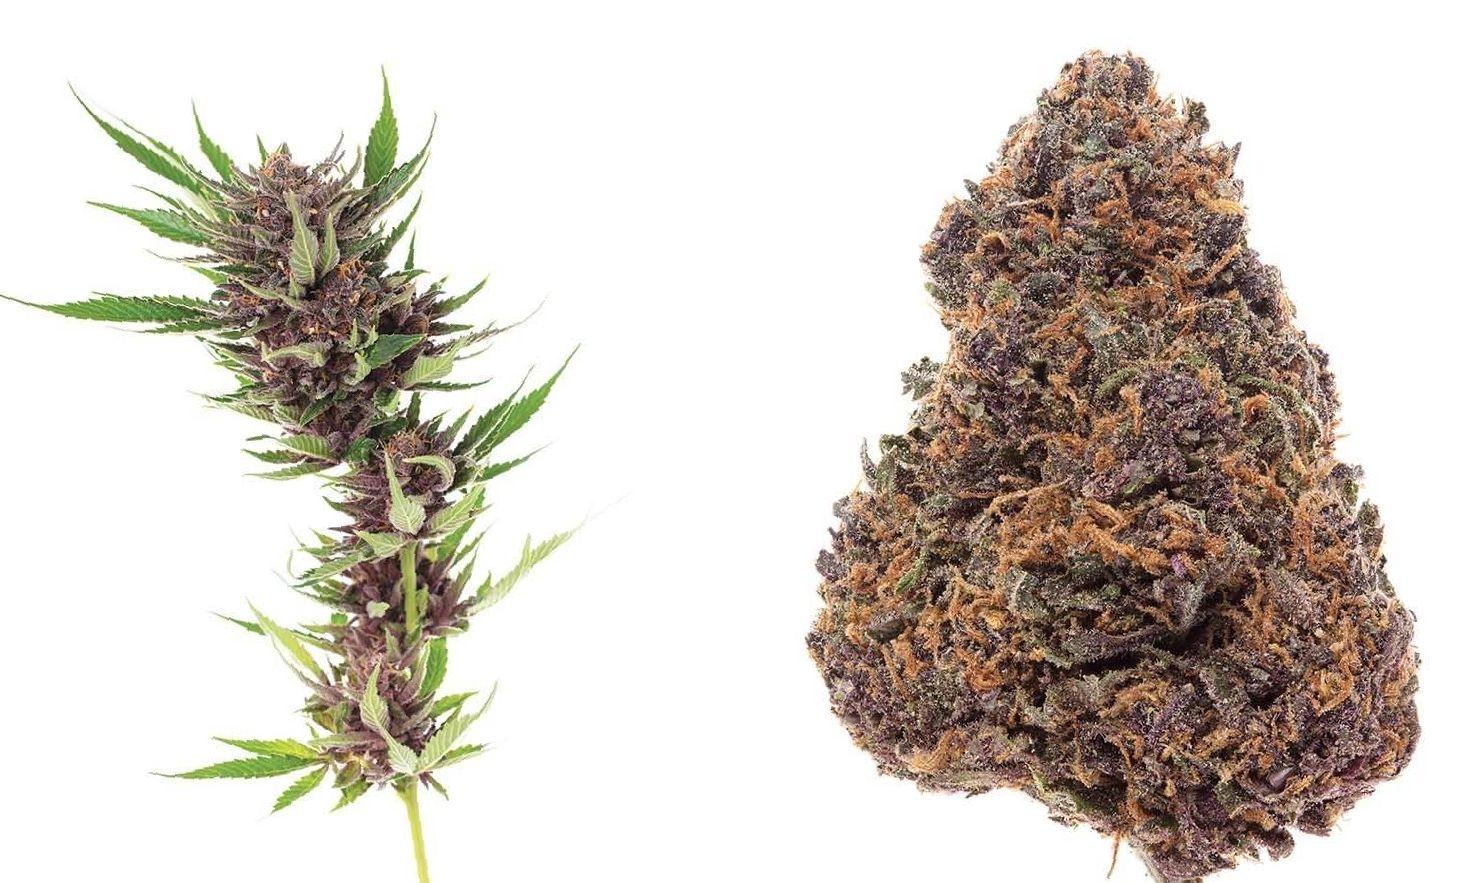 Forbidden Fruit Strain cannabis photo